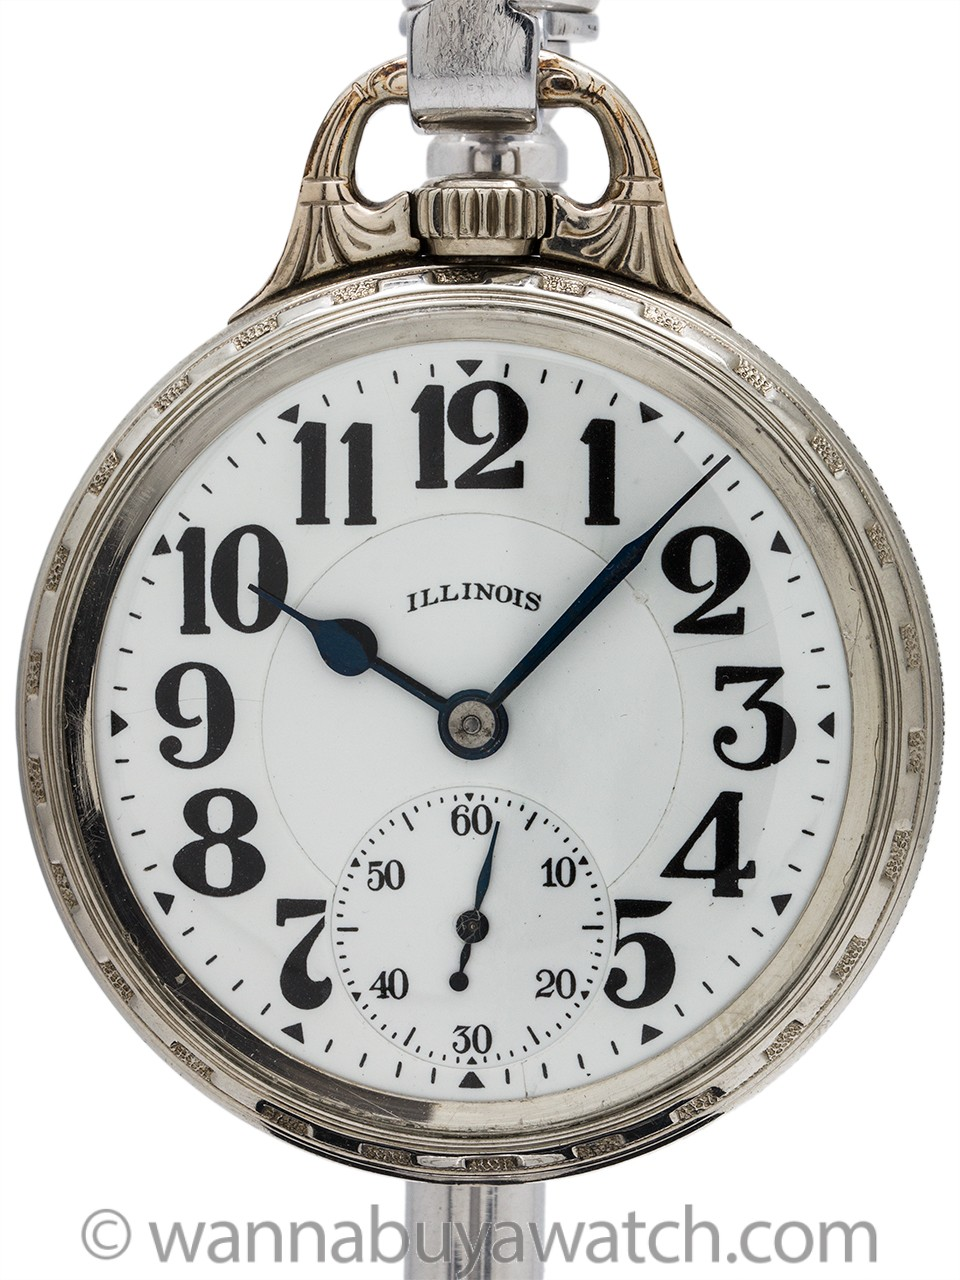 Illinois Bunn Special 21 Jewel 60 Hour Railroad Watch circa 1920's